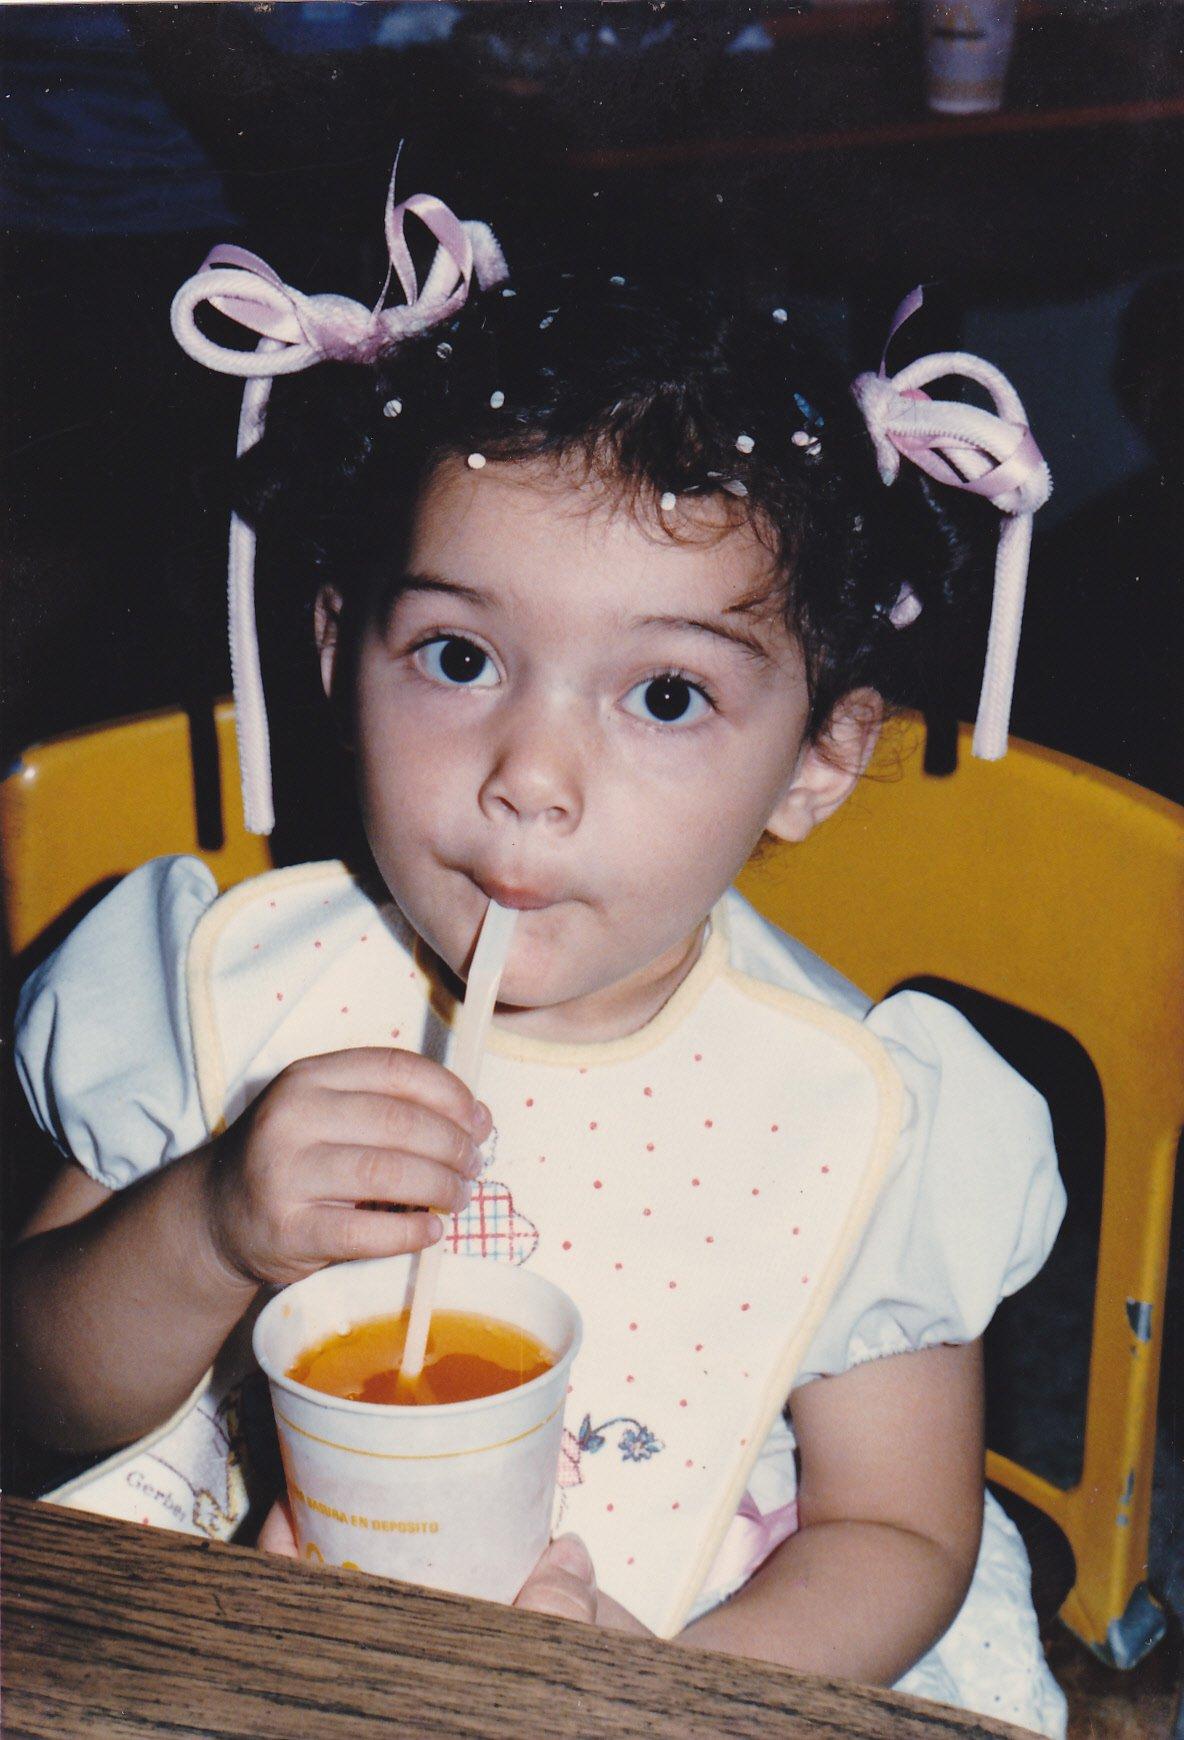 monica_zaldivar_baby_pic.jpg